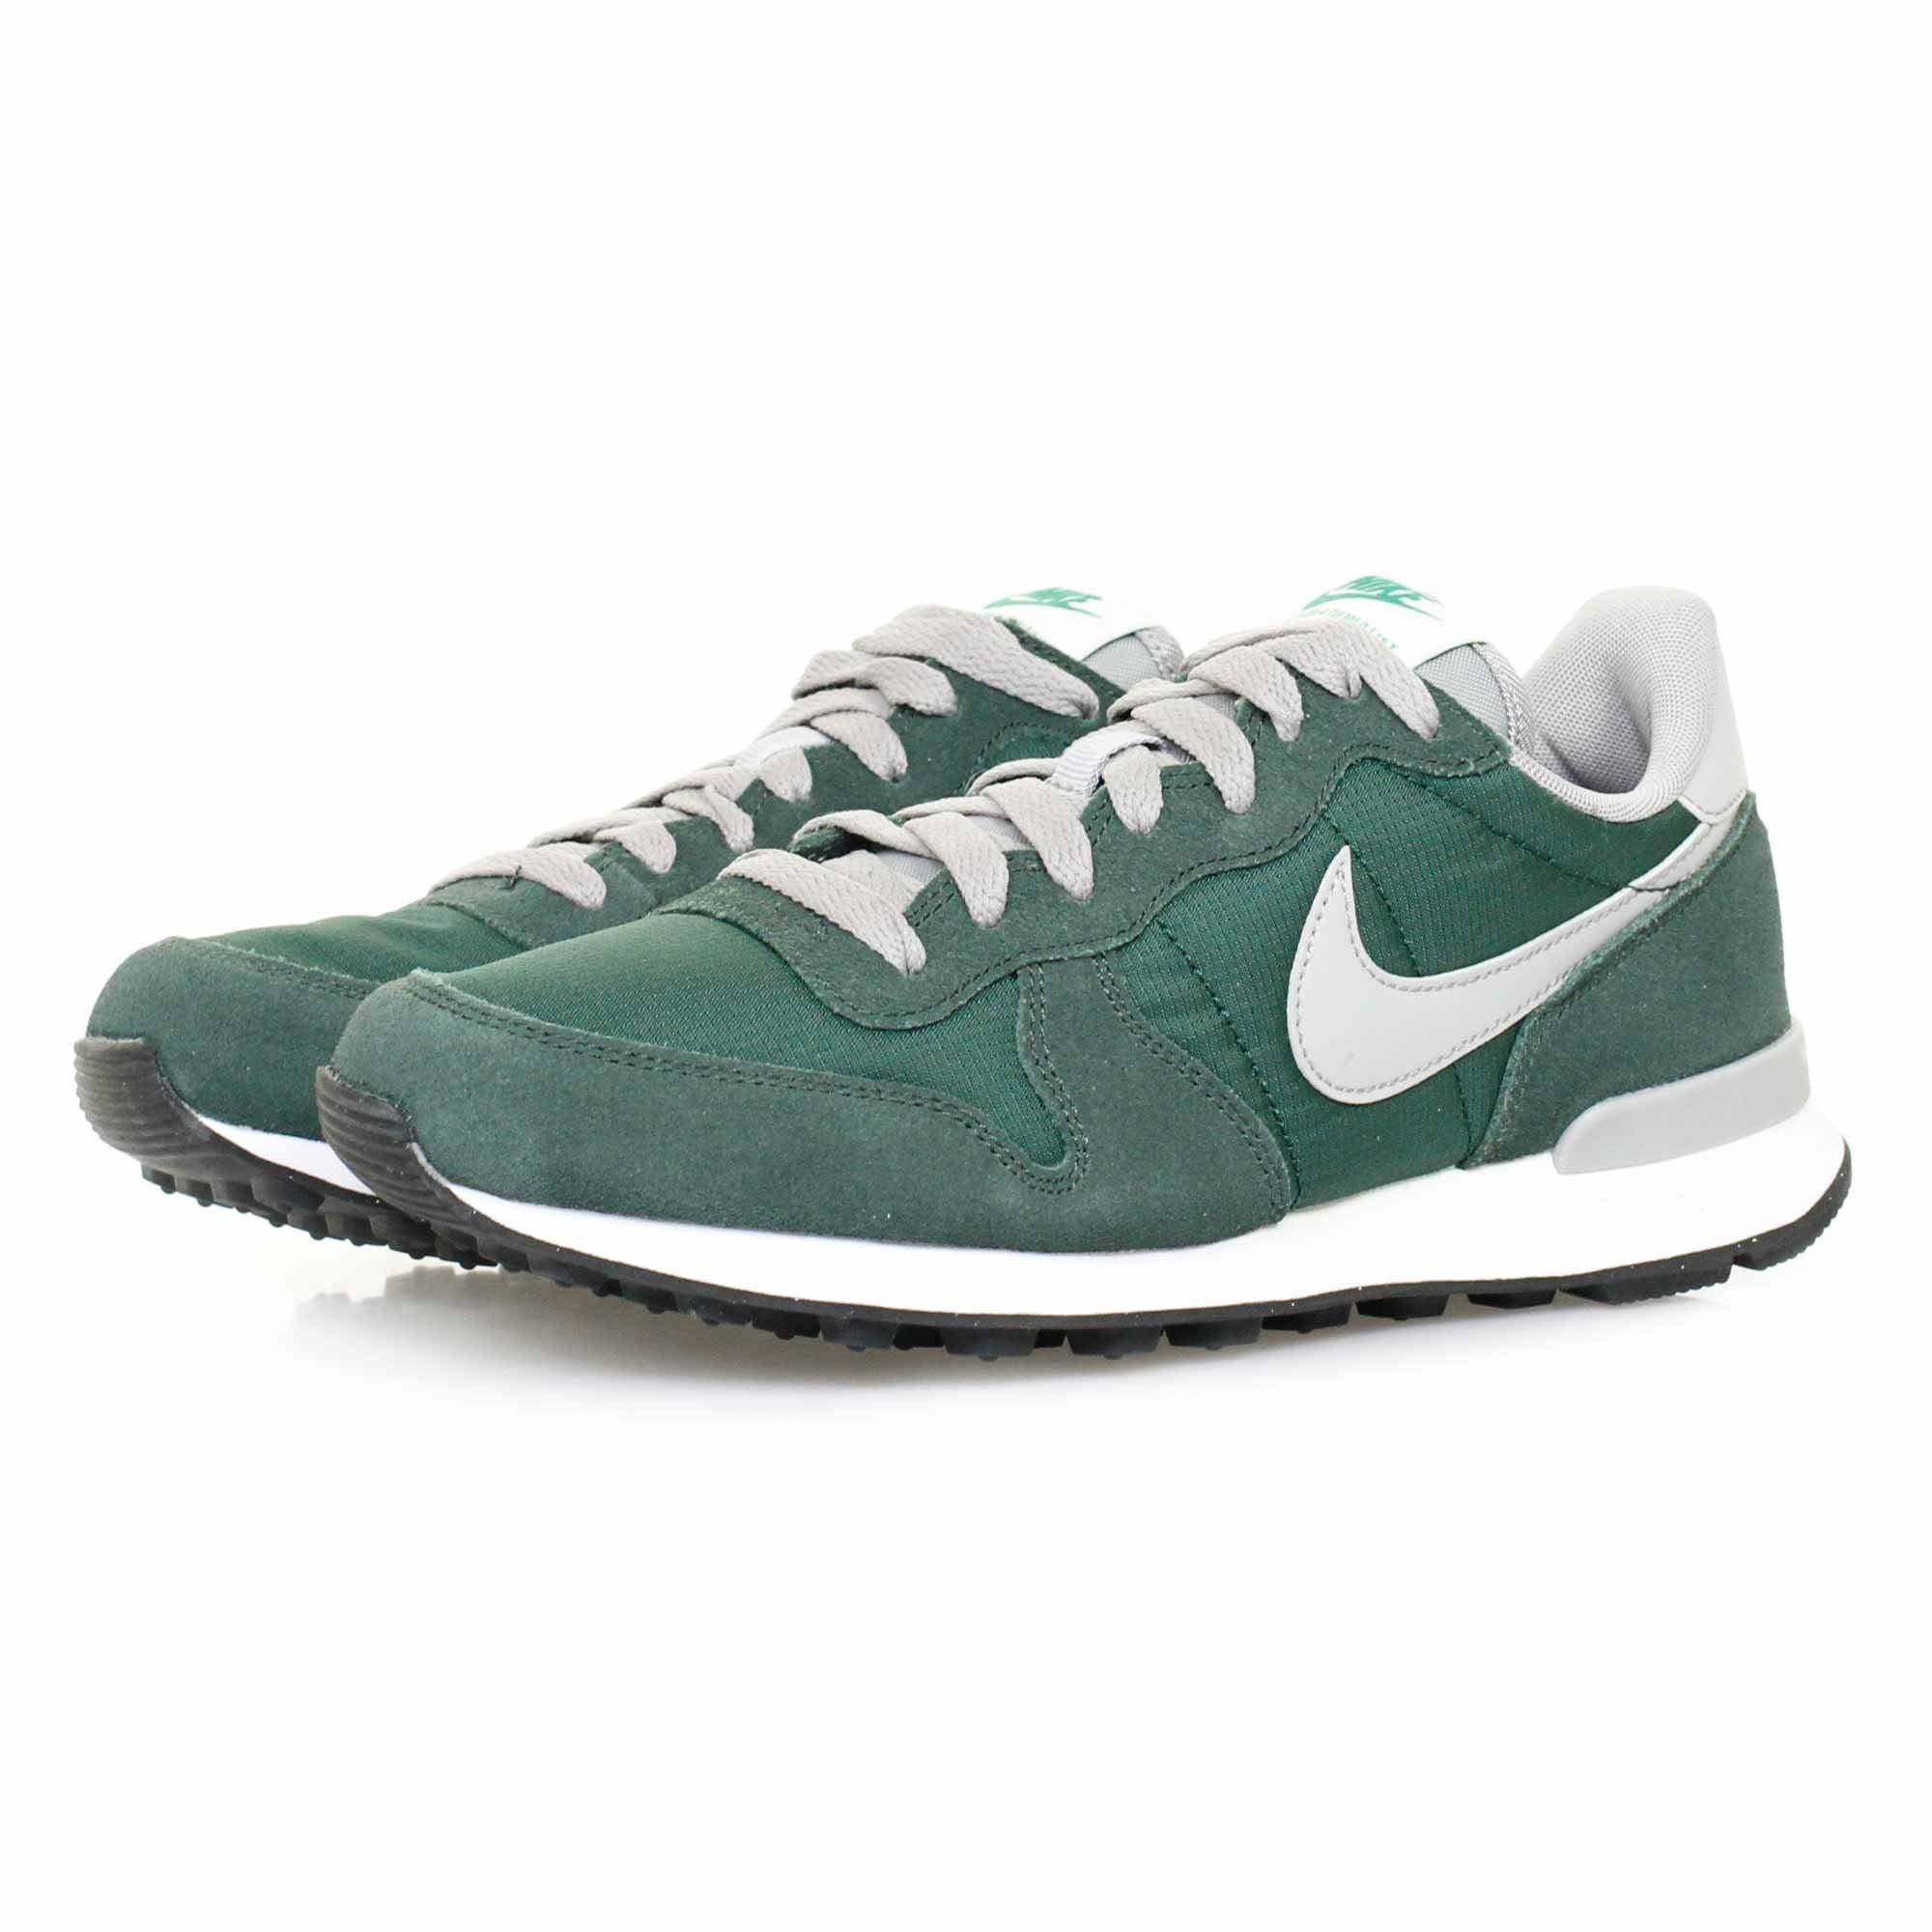 size 40 91b22 9bfd6 Nike Internationalist Gorge Green Shoe 828041 in Green for Men - Lyst